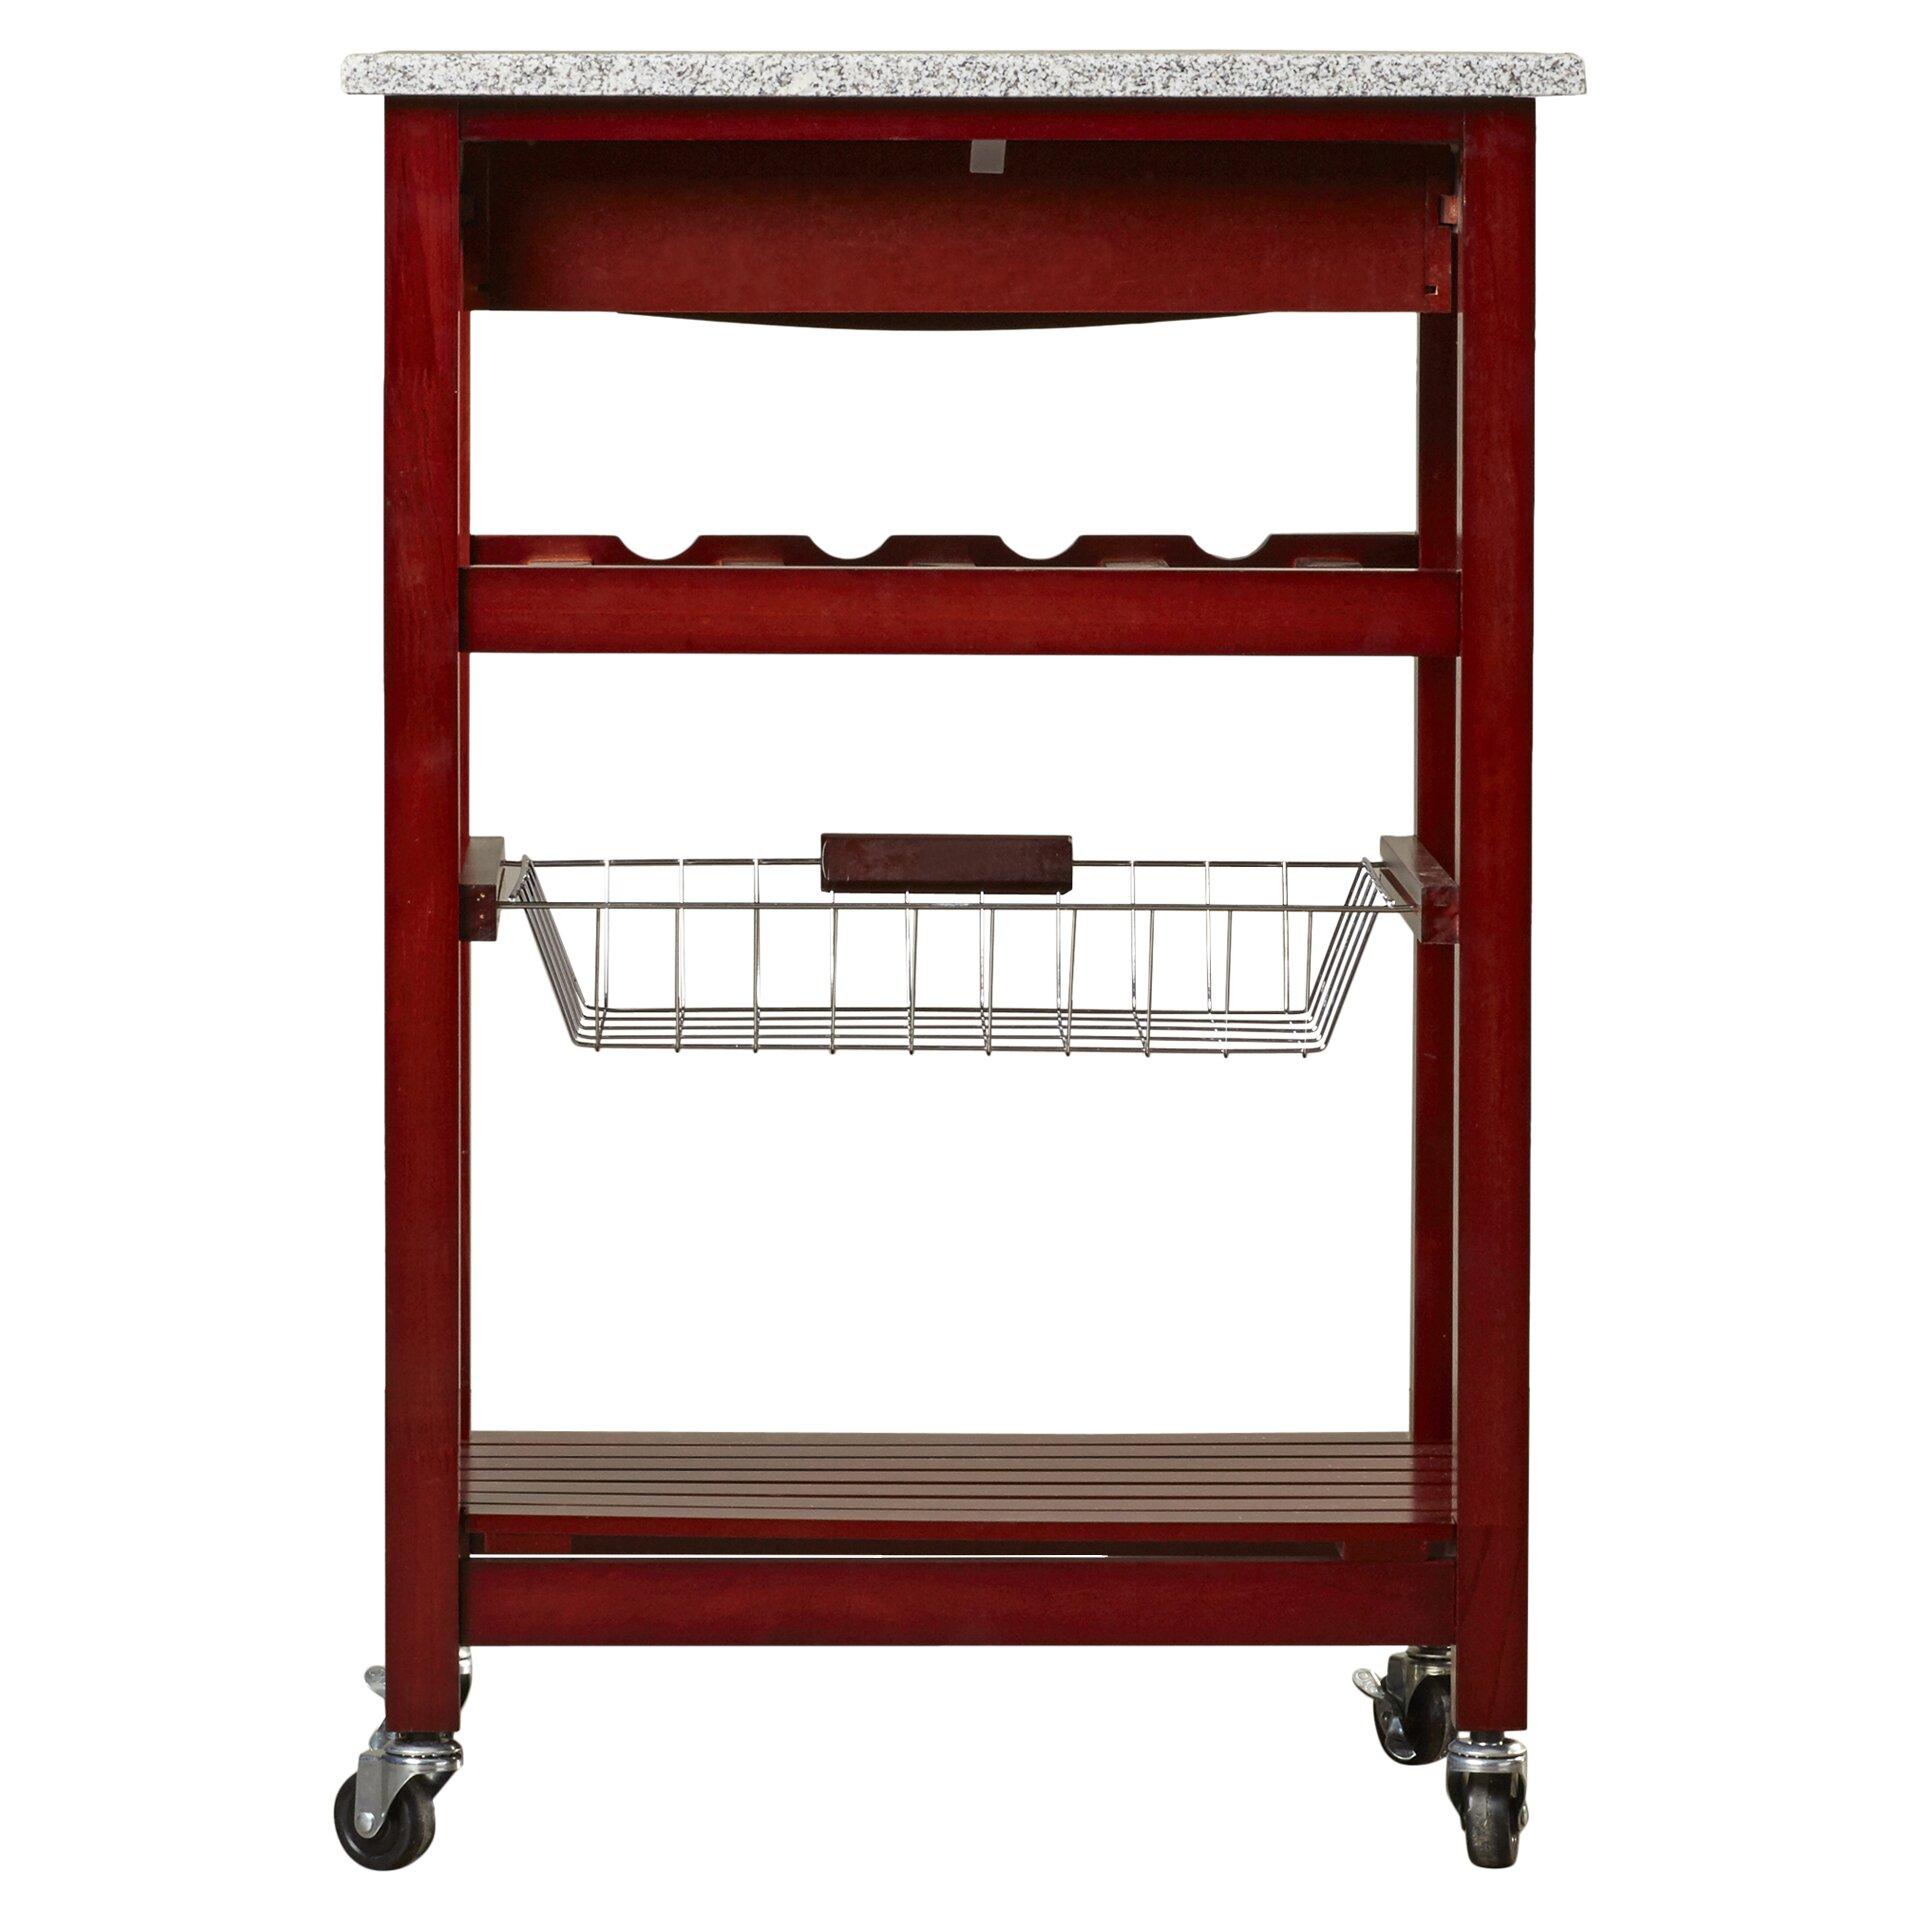 Kitchen Carts With Granite Top Varick Gallery Flint Kitchen Cart With Granite Top Reviews Wayfair